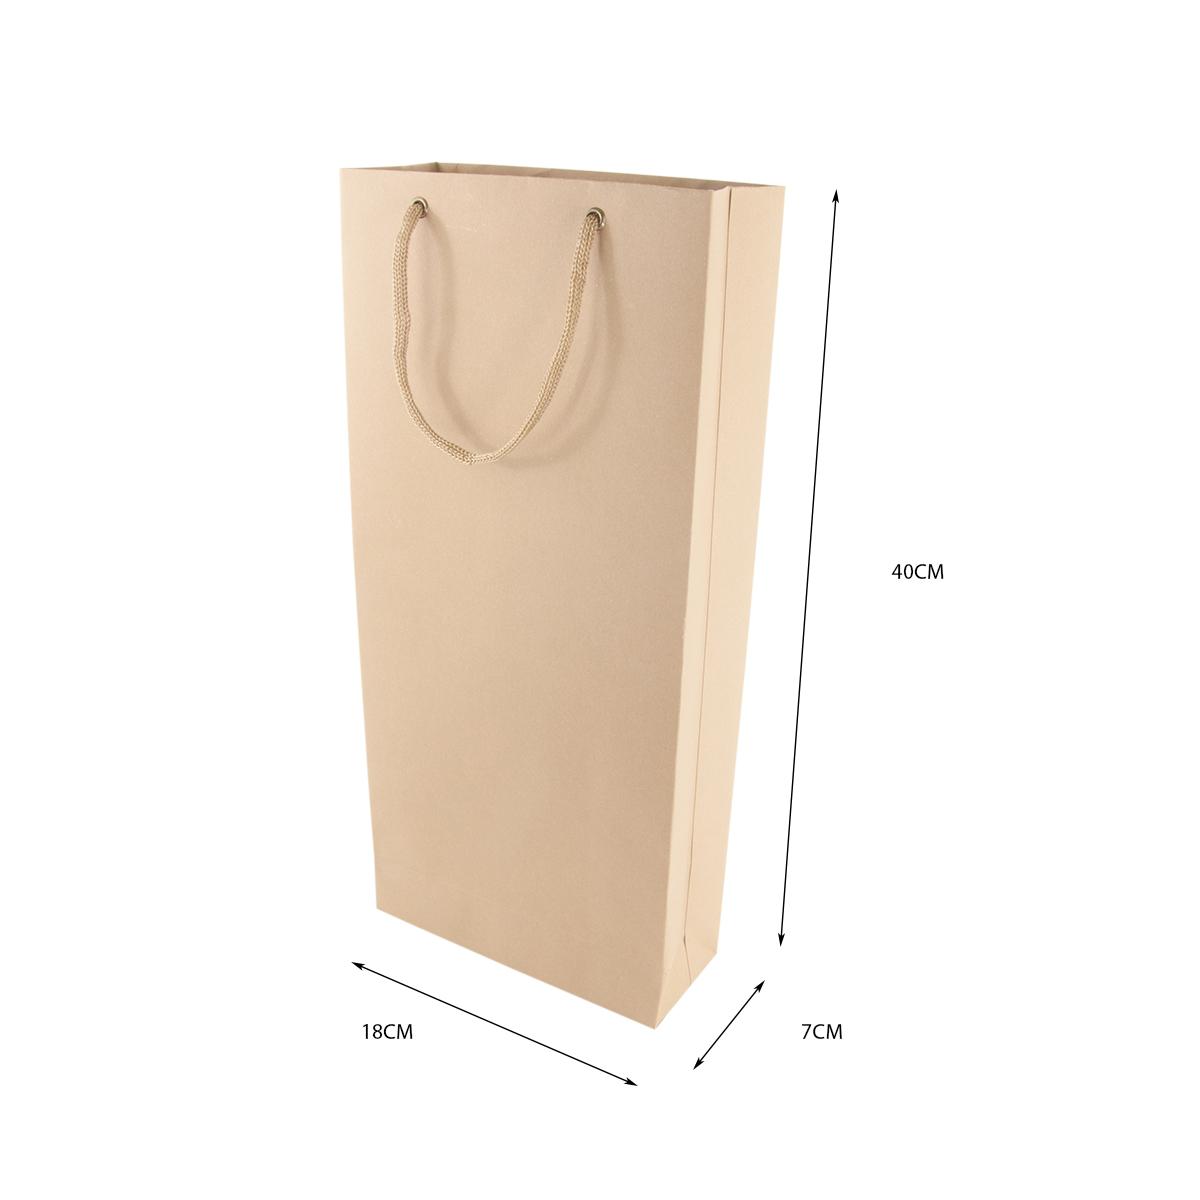 Sacola para 2 Garrafas Vinho Kraft 40x18x7 - 10 Unidades